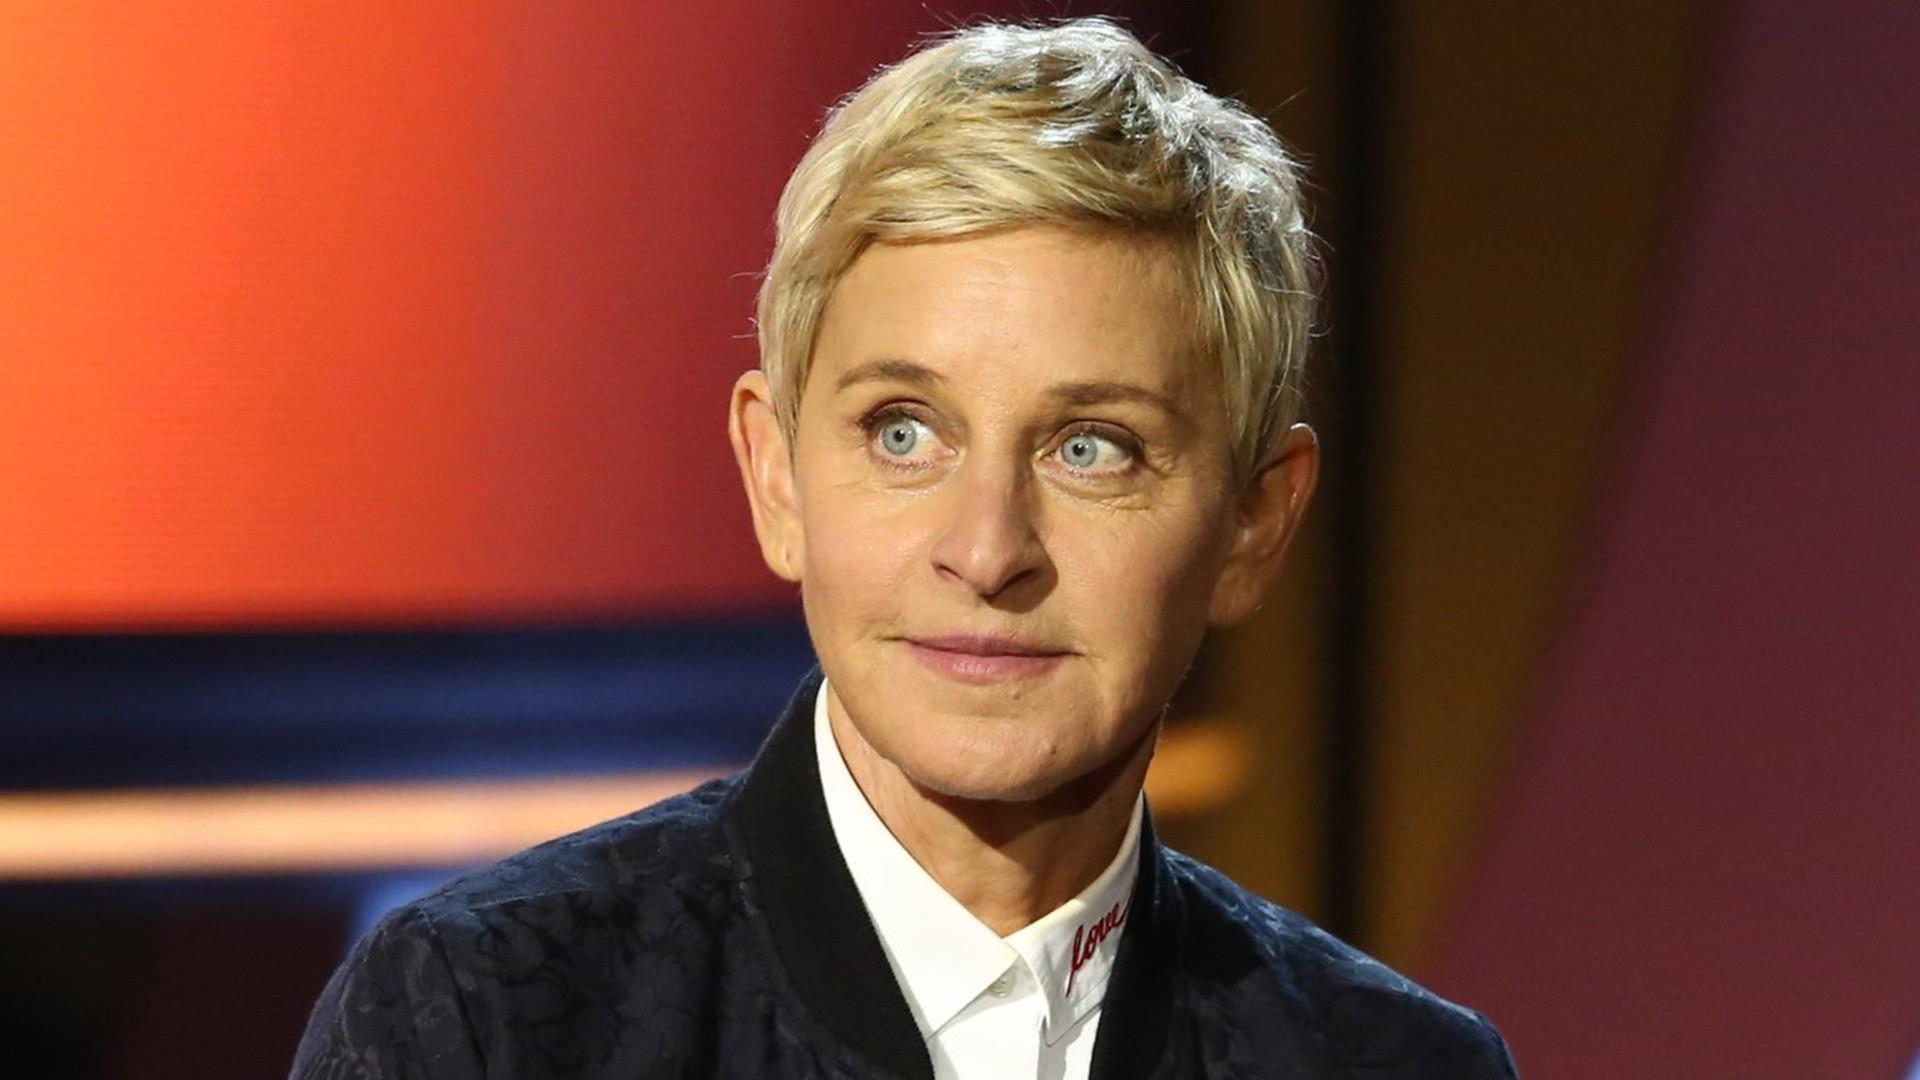 Ellen DeGeneres and George W. Bush's Cowboys meet-up reveals the cost of acceptance